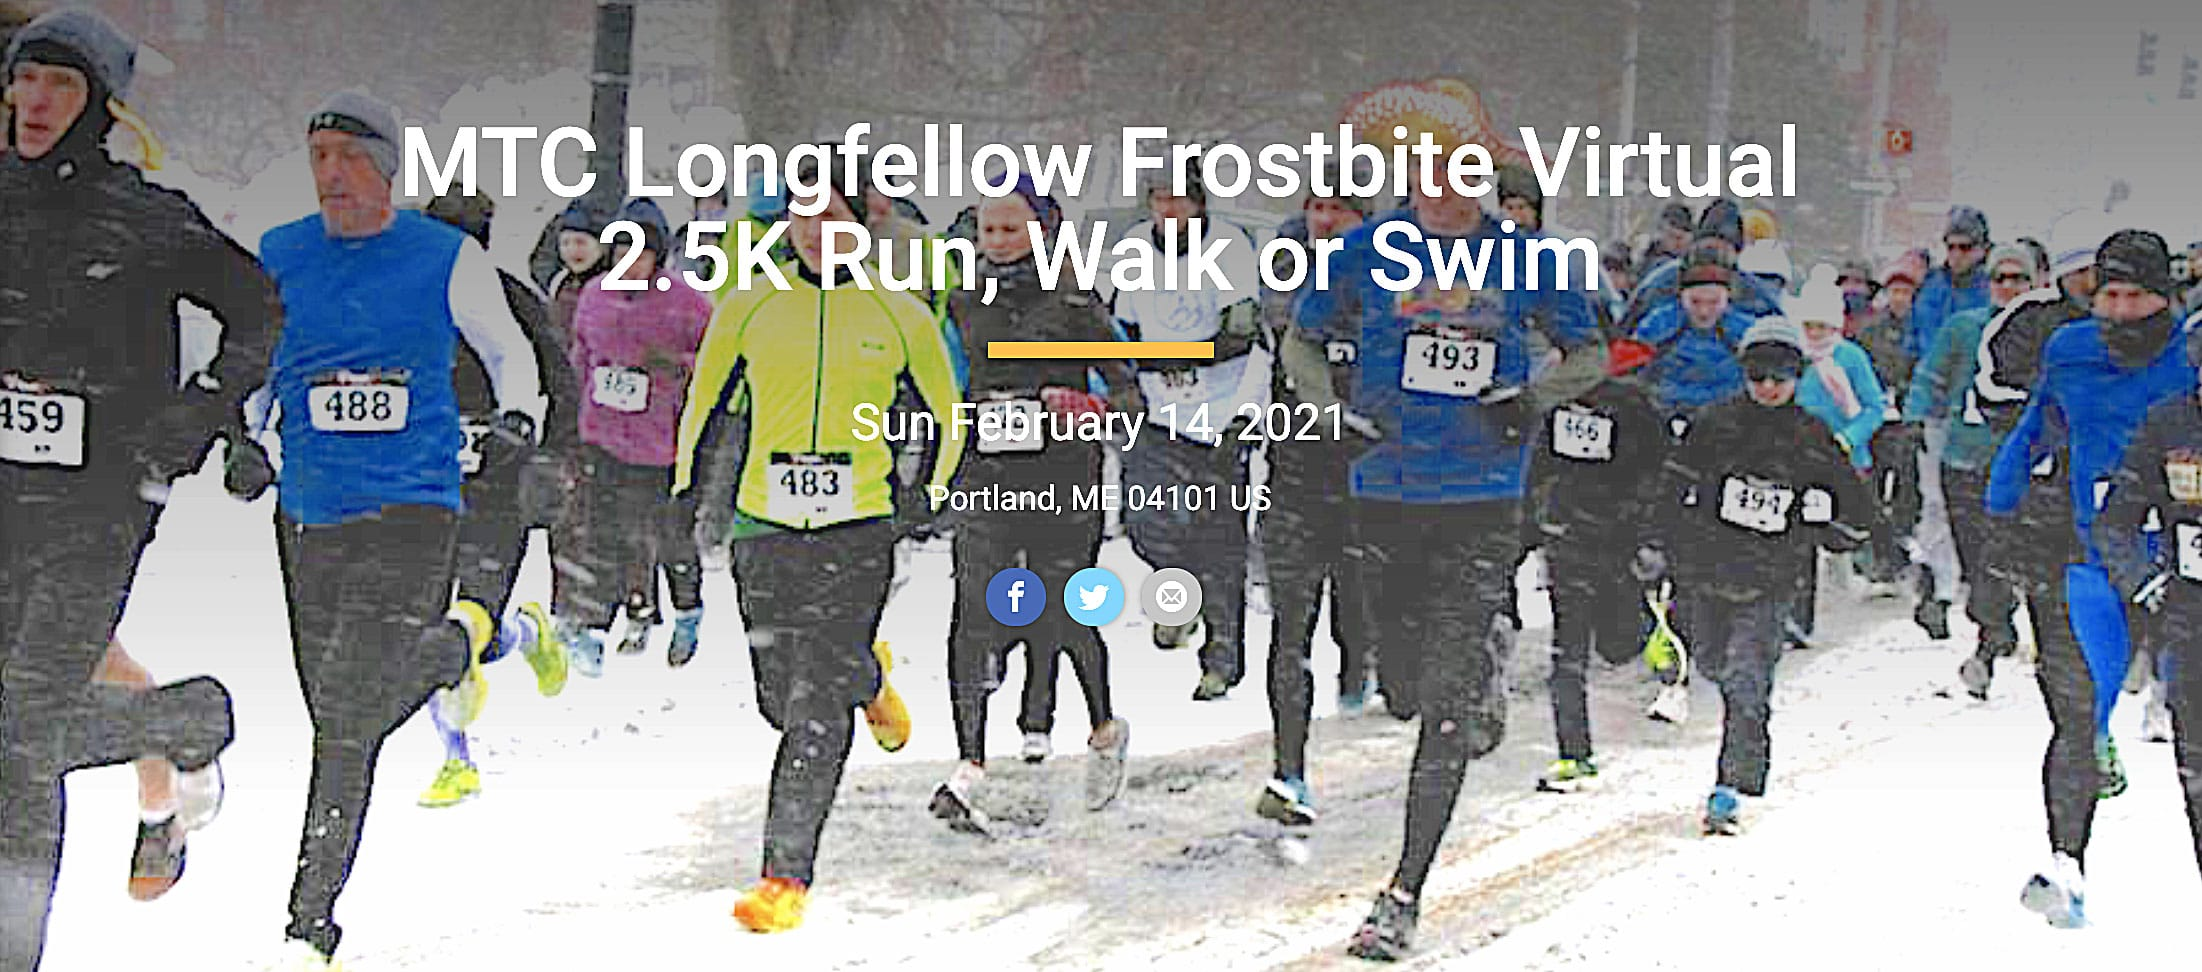 MTC Longfellow Frostbite 2.5K 2021